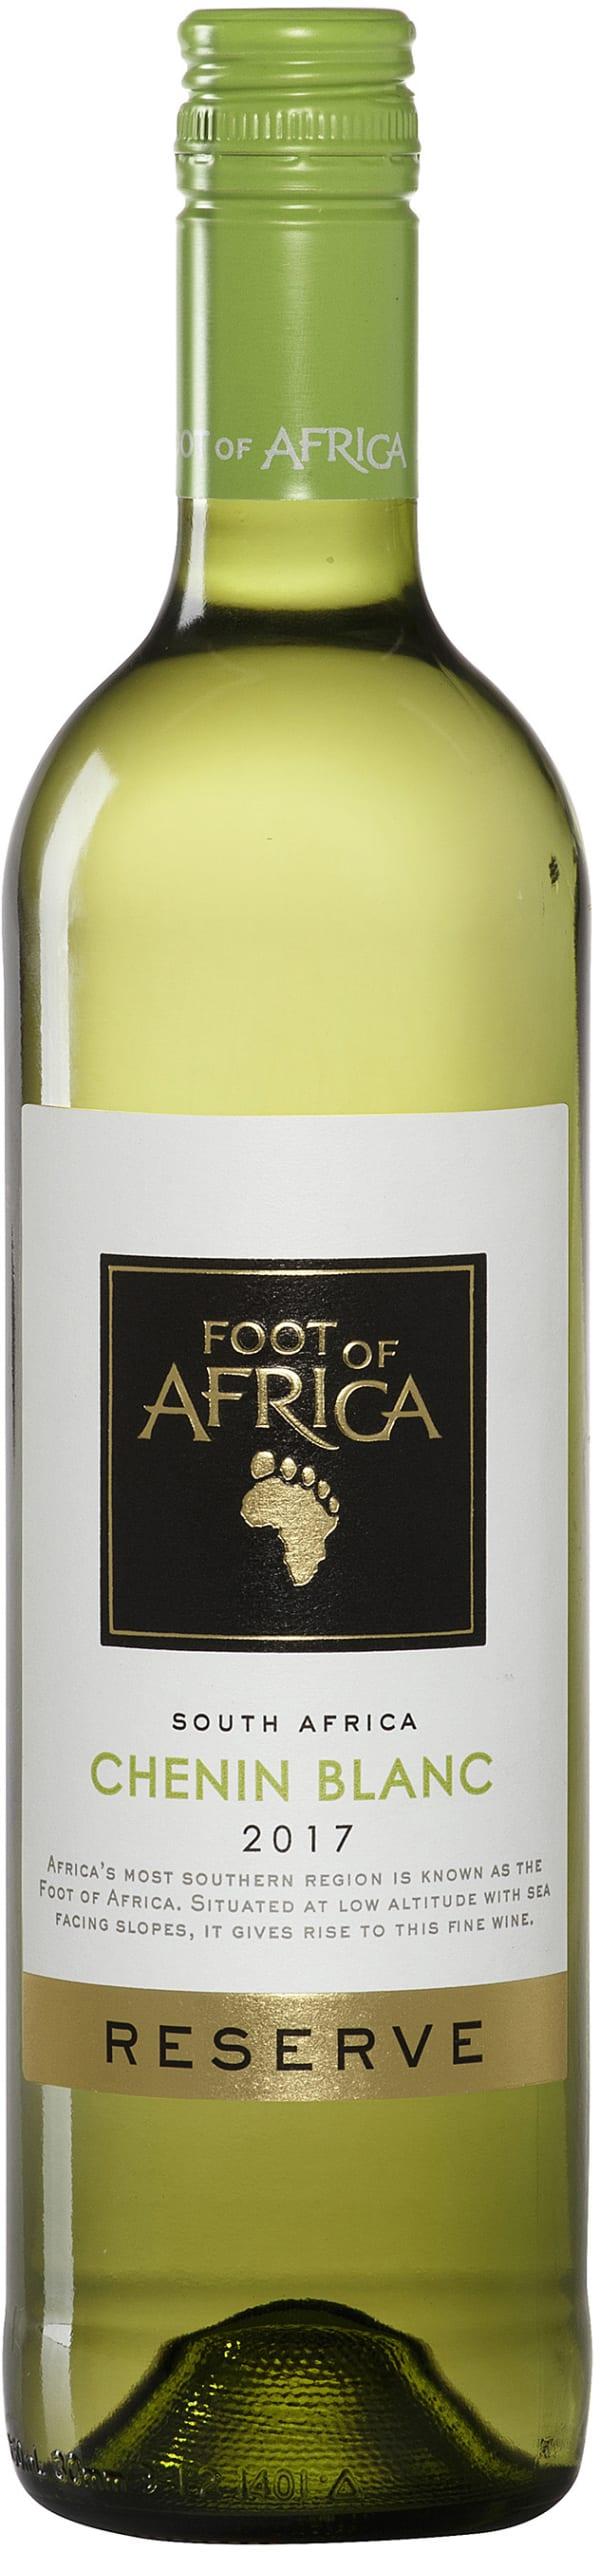 Foot of Africa Reserve Chenin Blanc 2016